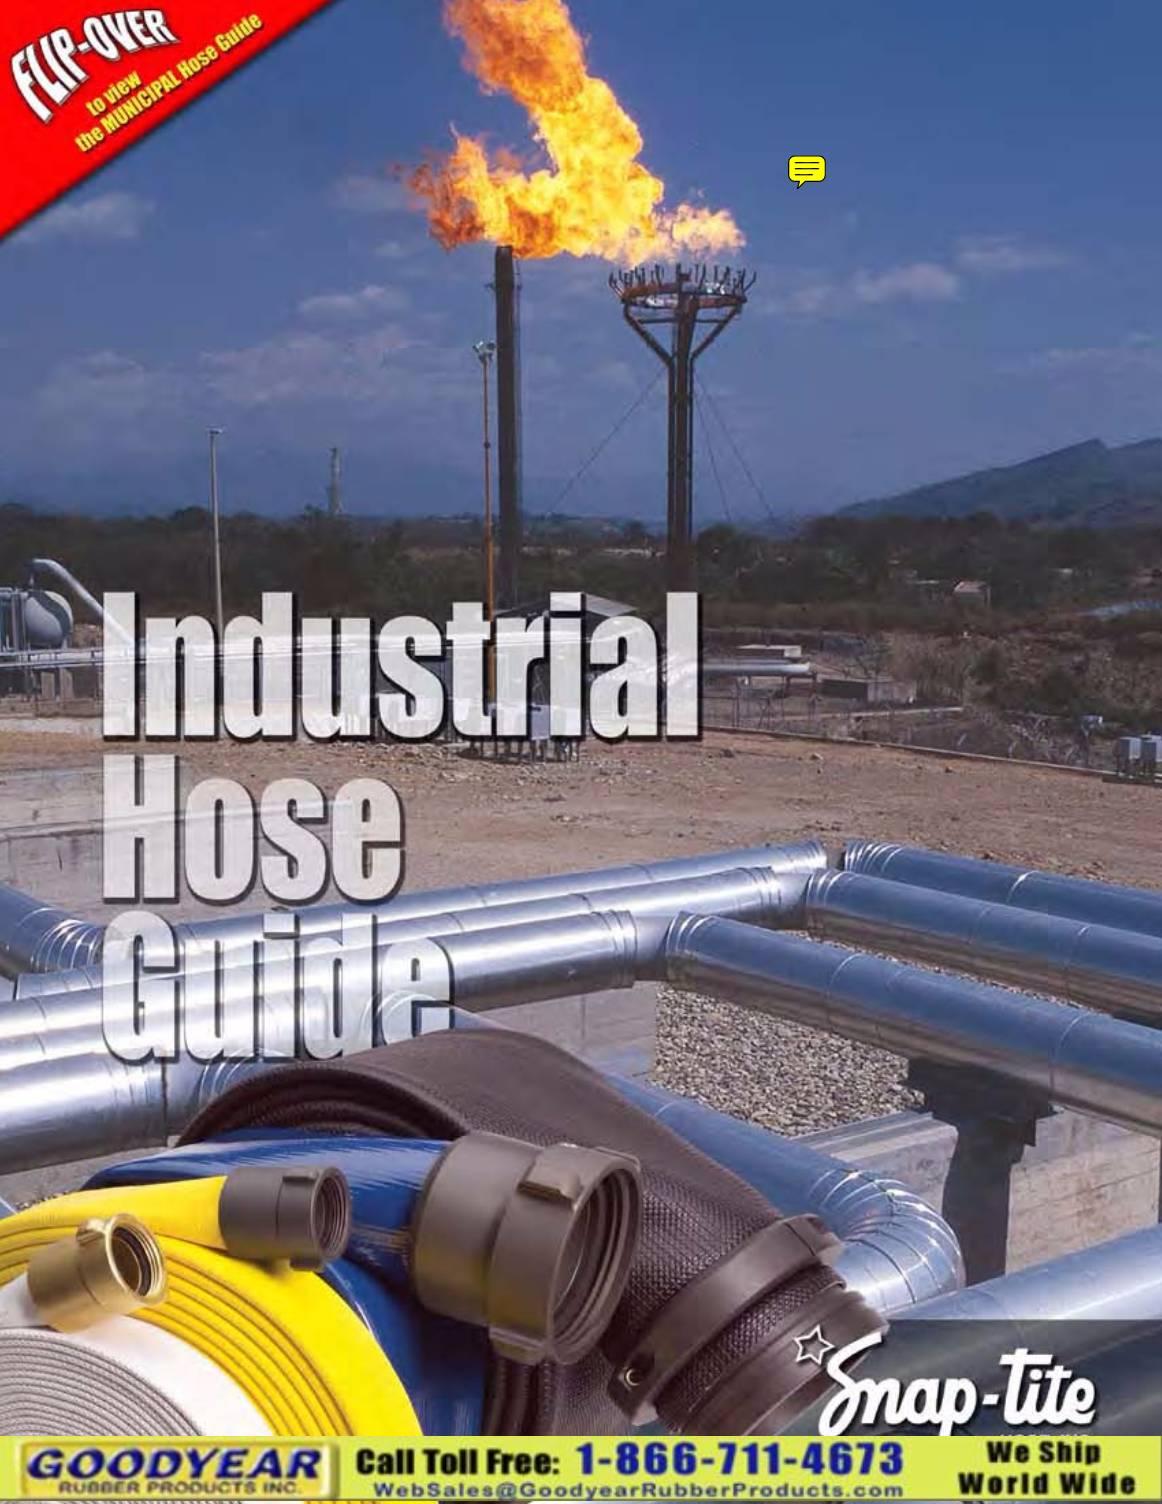 Snaptite Industrial Hose